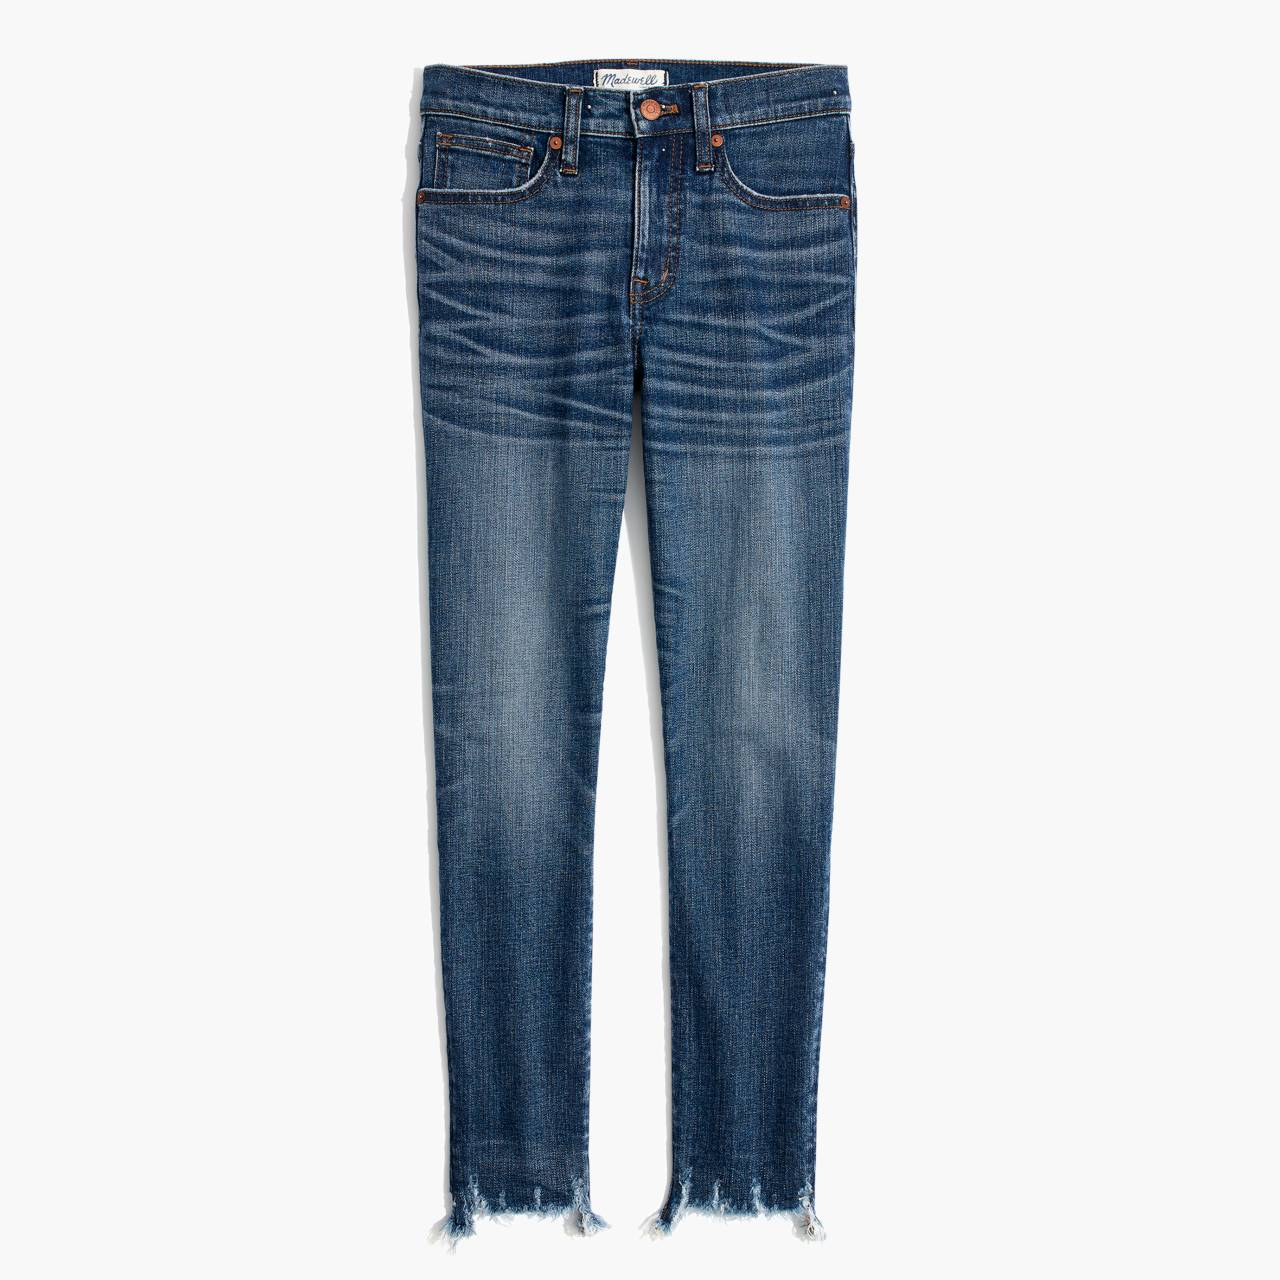 "9"" High-Rise Skinny Crop Jeans: Destructed-Hem Edition in miranda wash image 4"